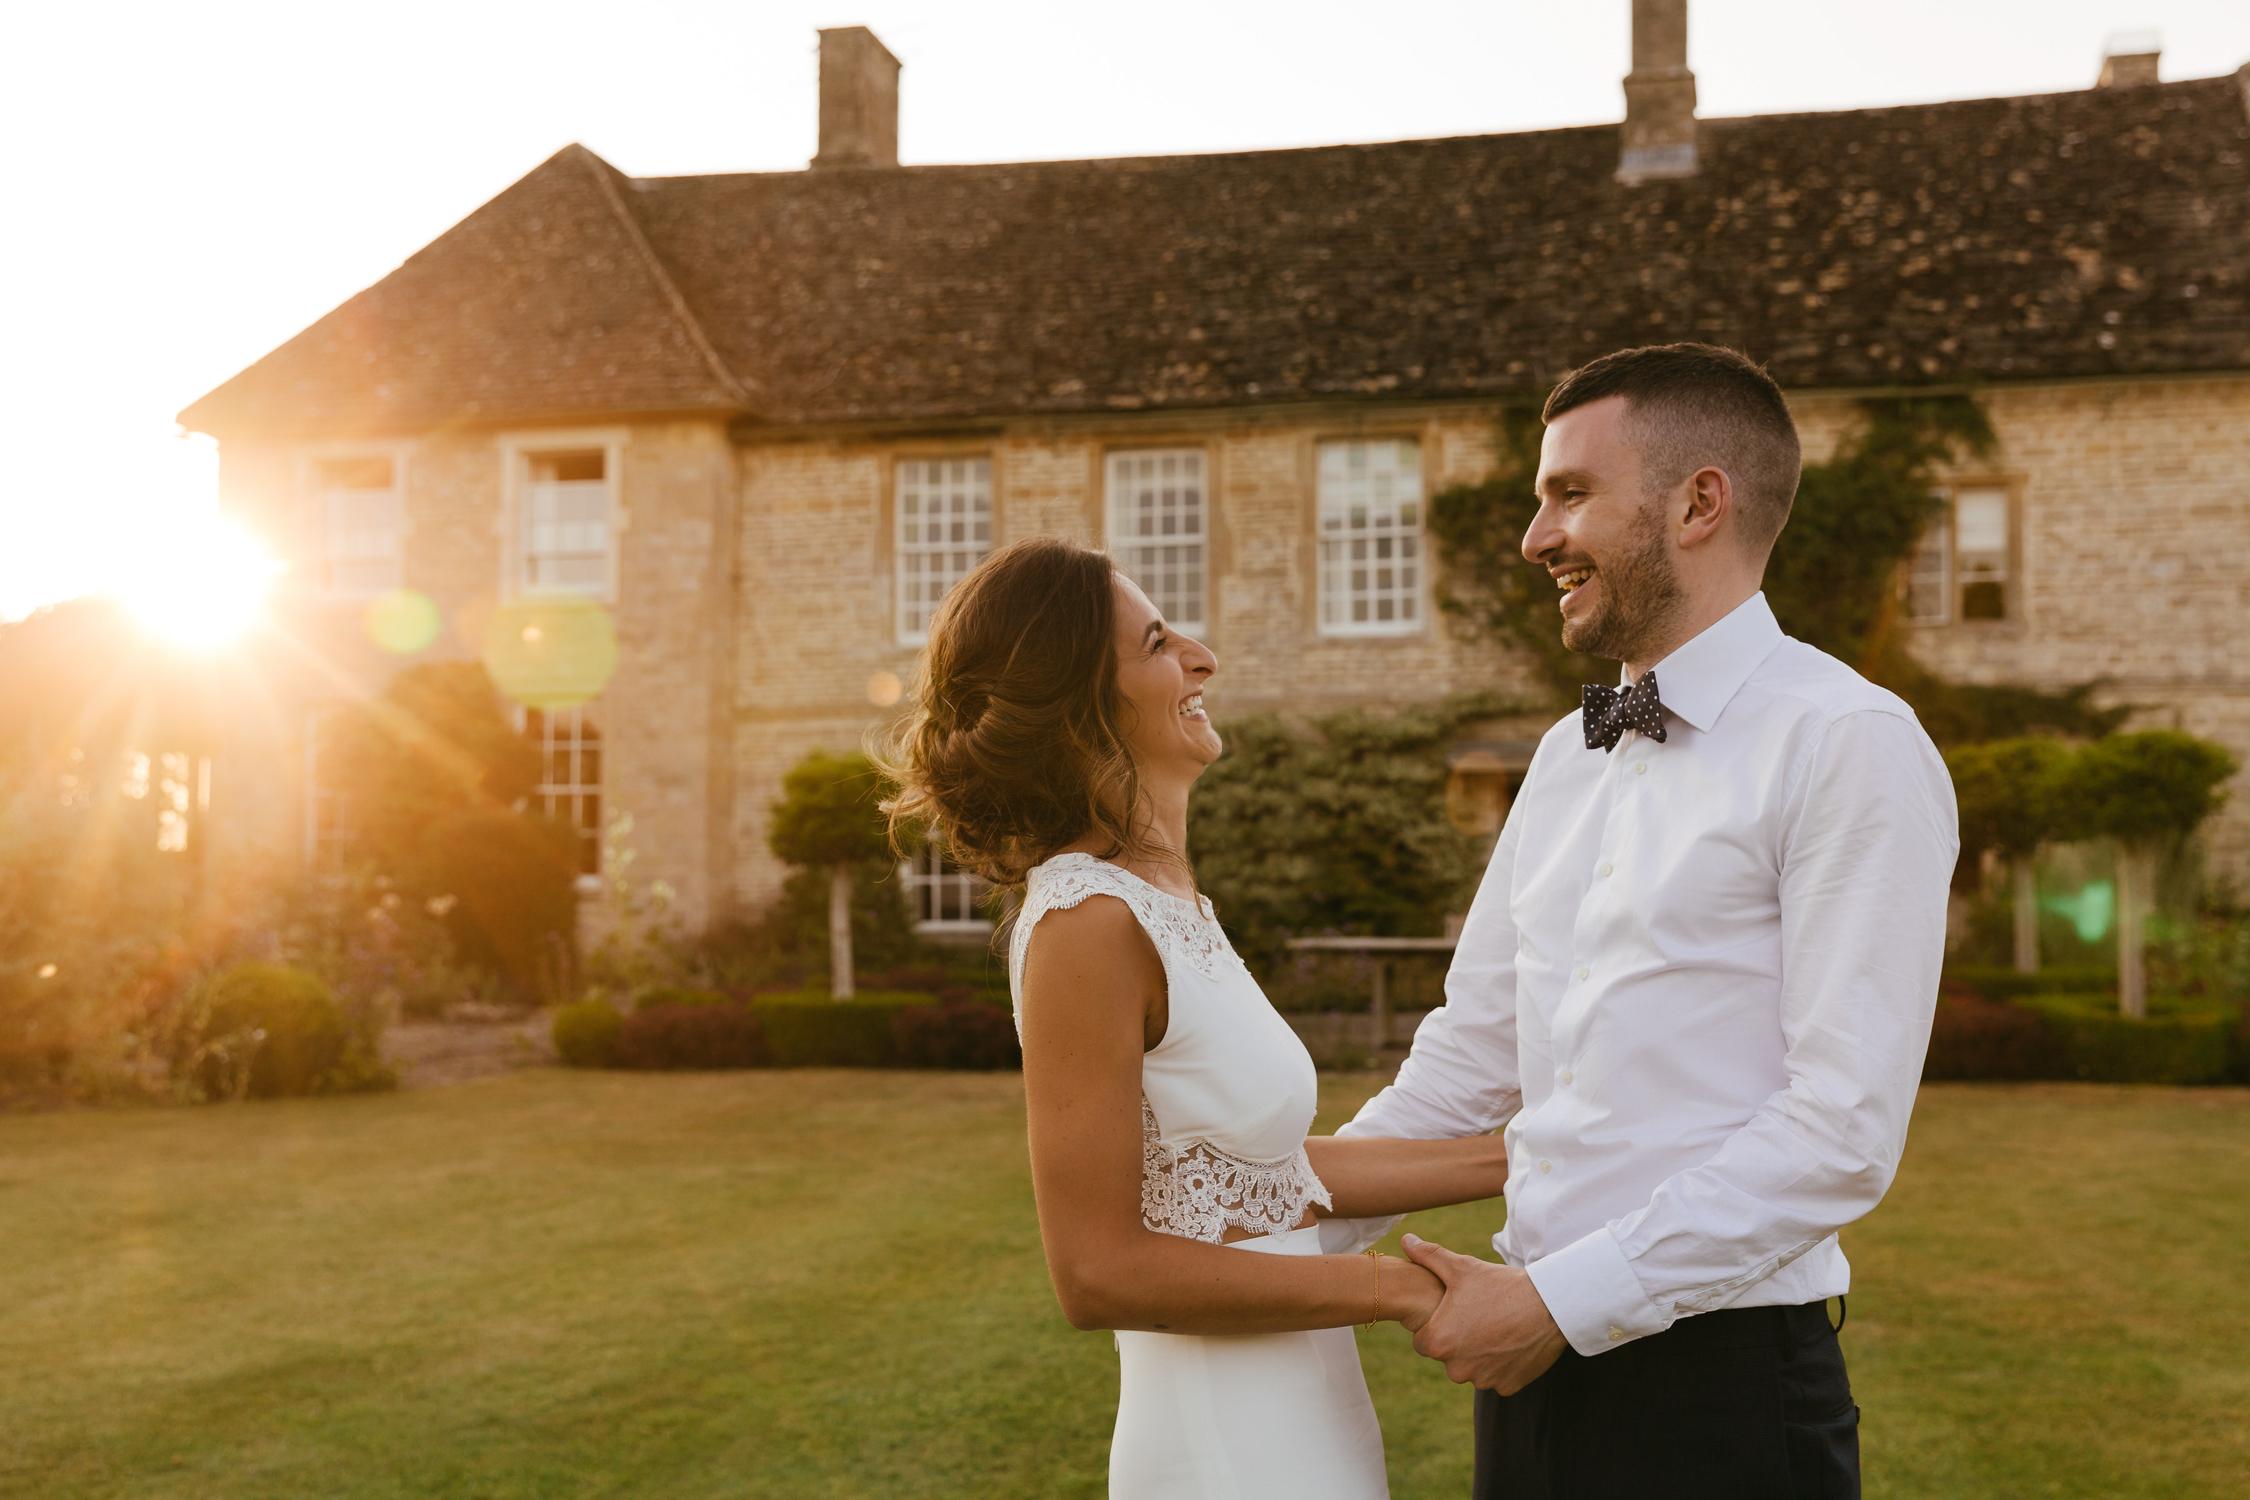 natural wedding photography at oxleaze barn